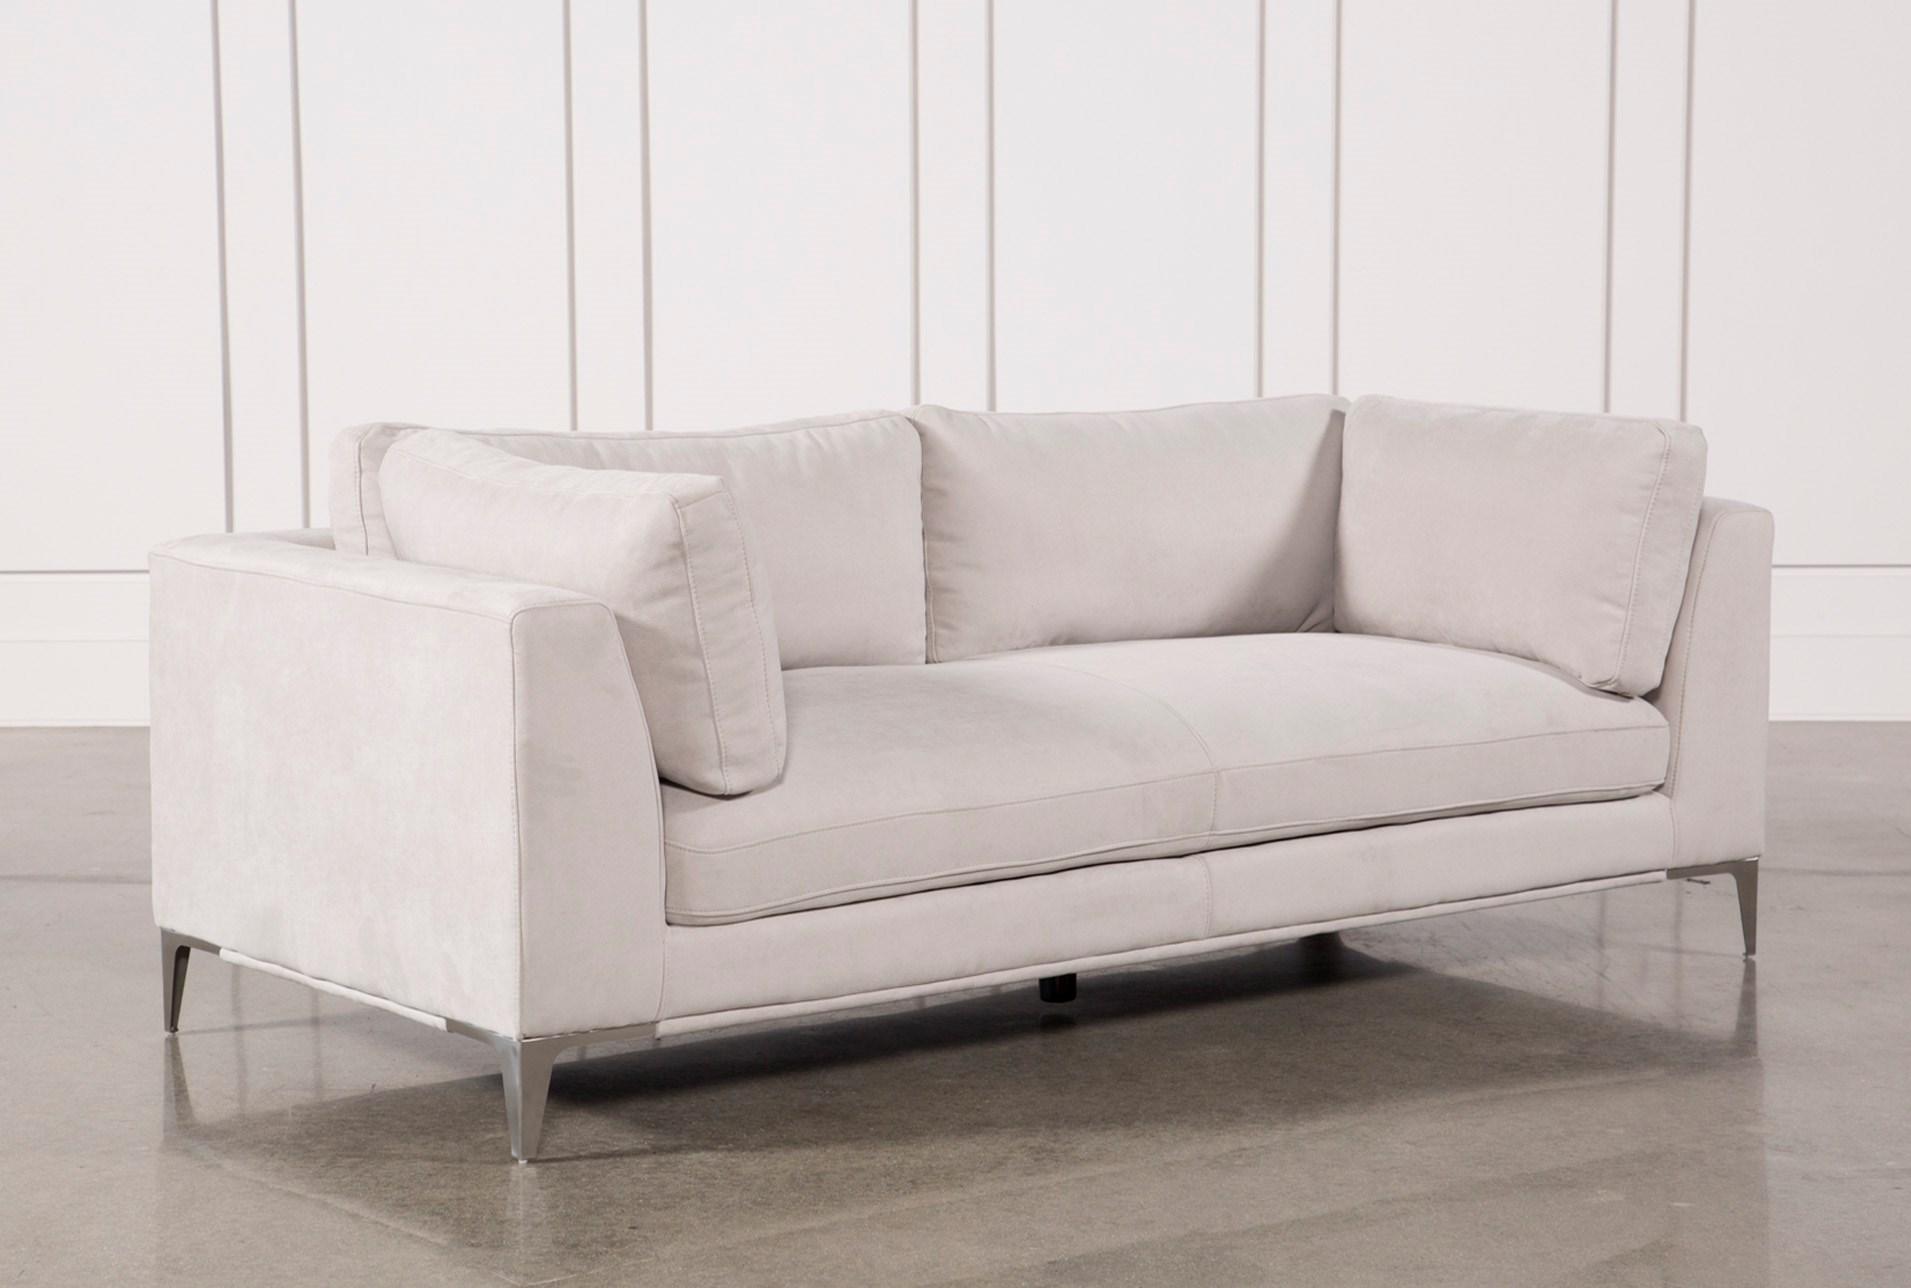 apollo light grey sofa w 2 pillows living spaces